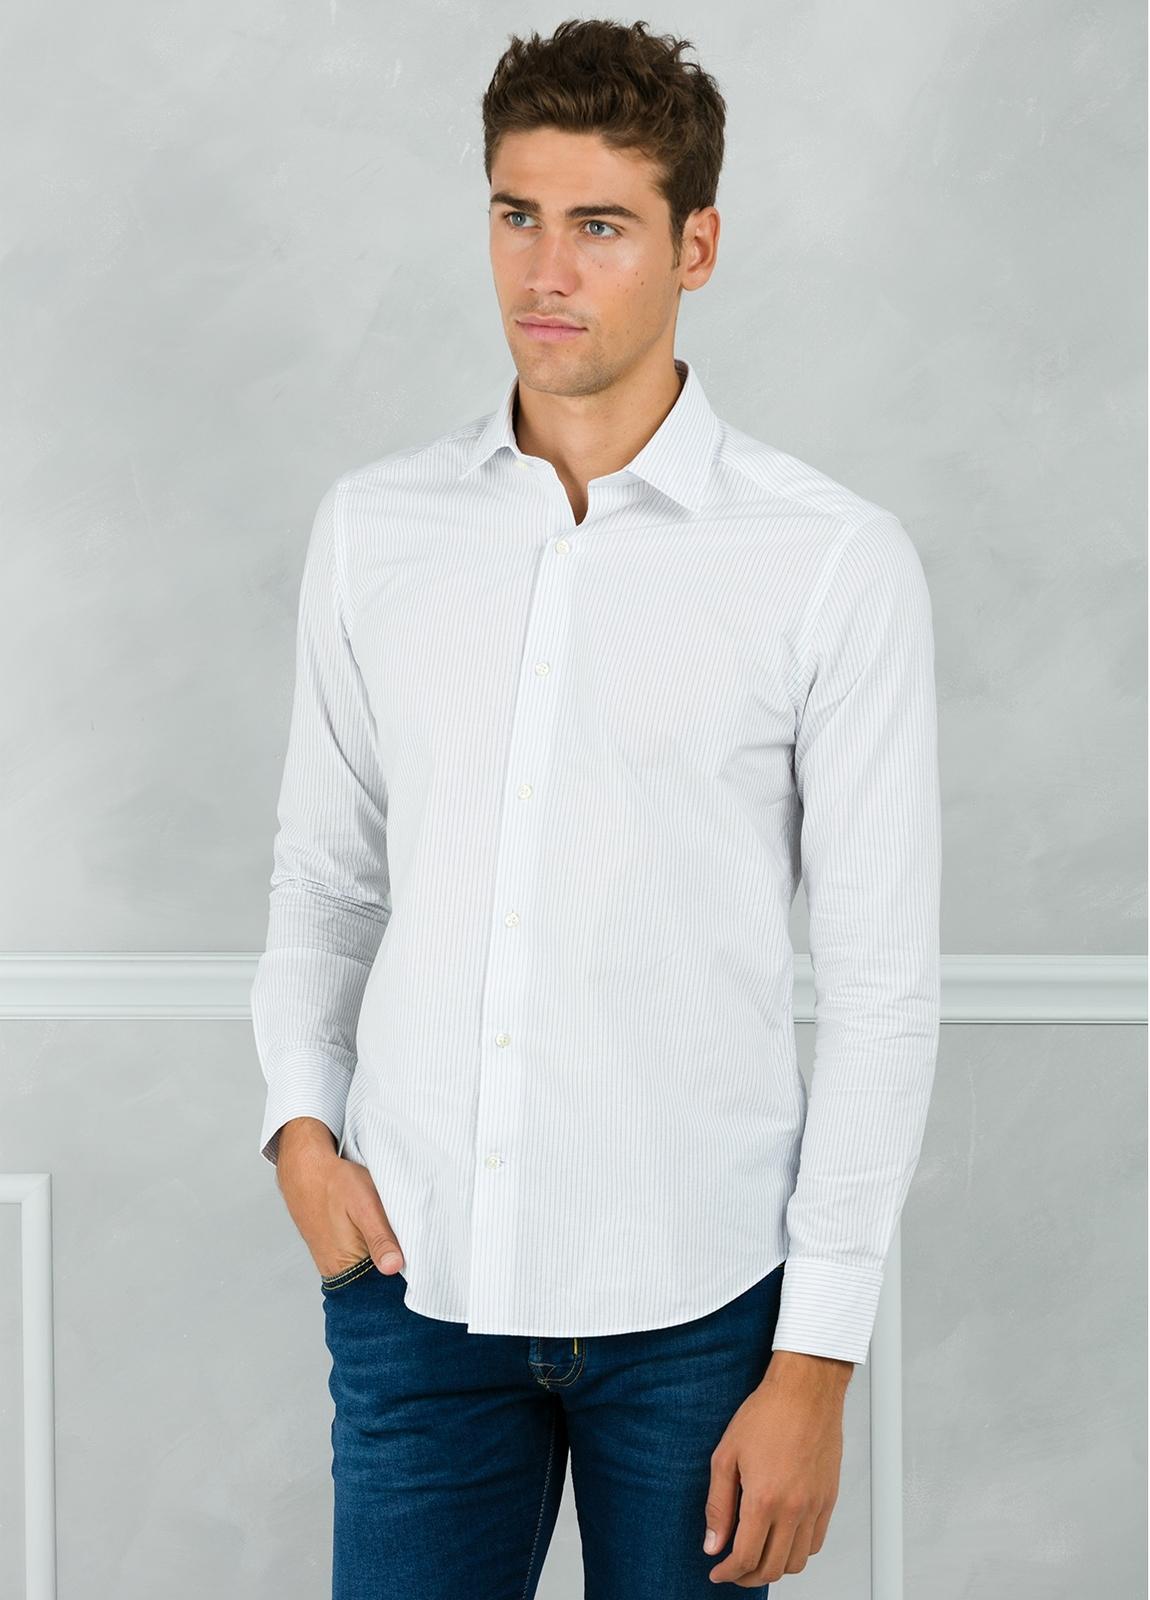 Camisa Leisure Wear SLIM FIT modelo PORTO microraya color blanco. 100% Algodón.